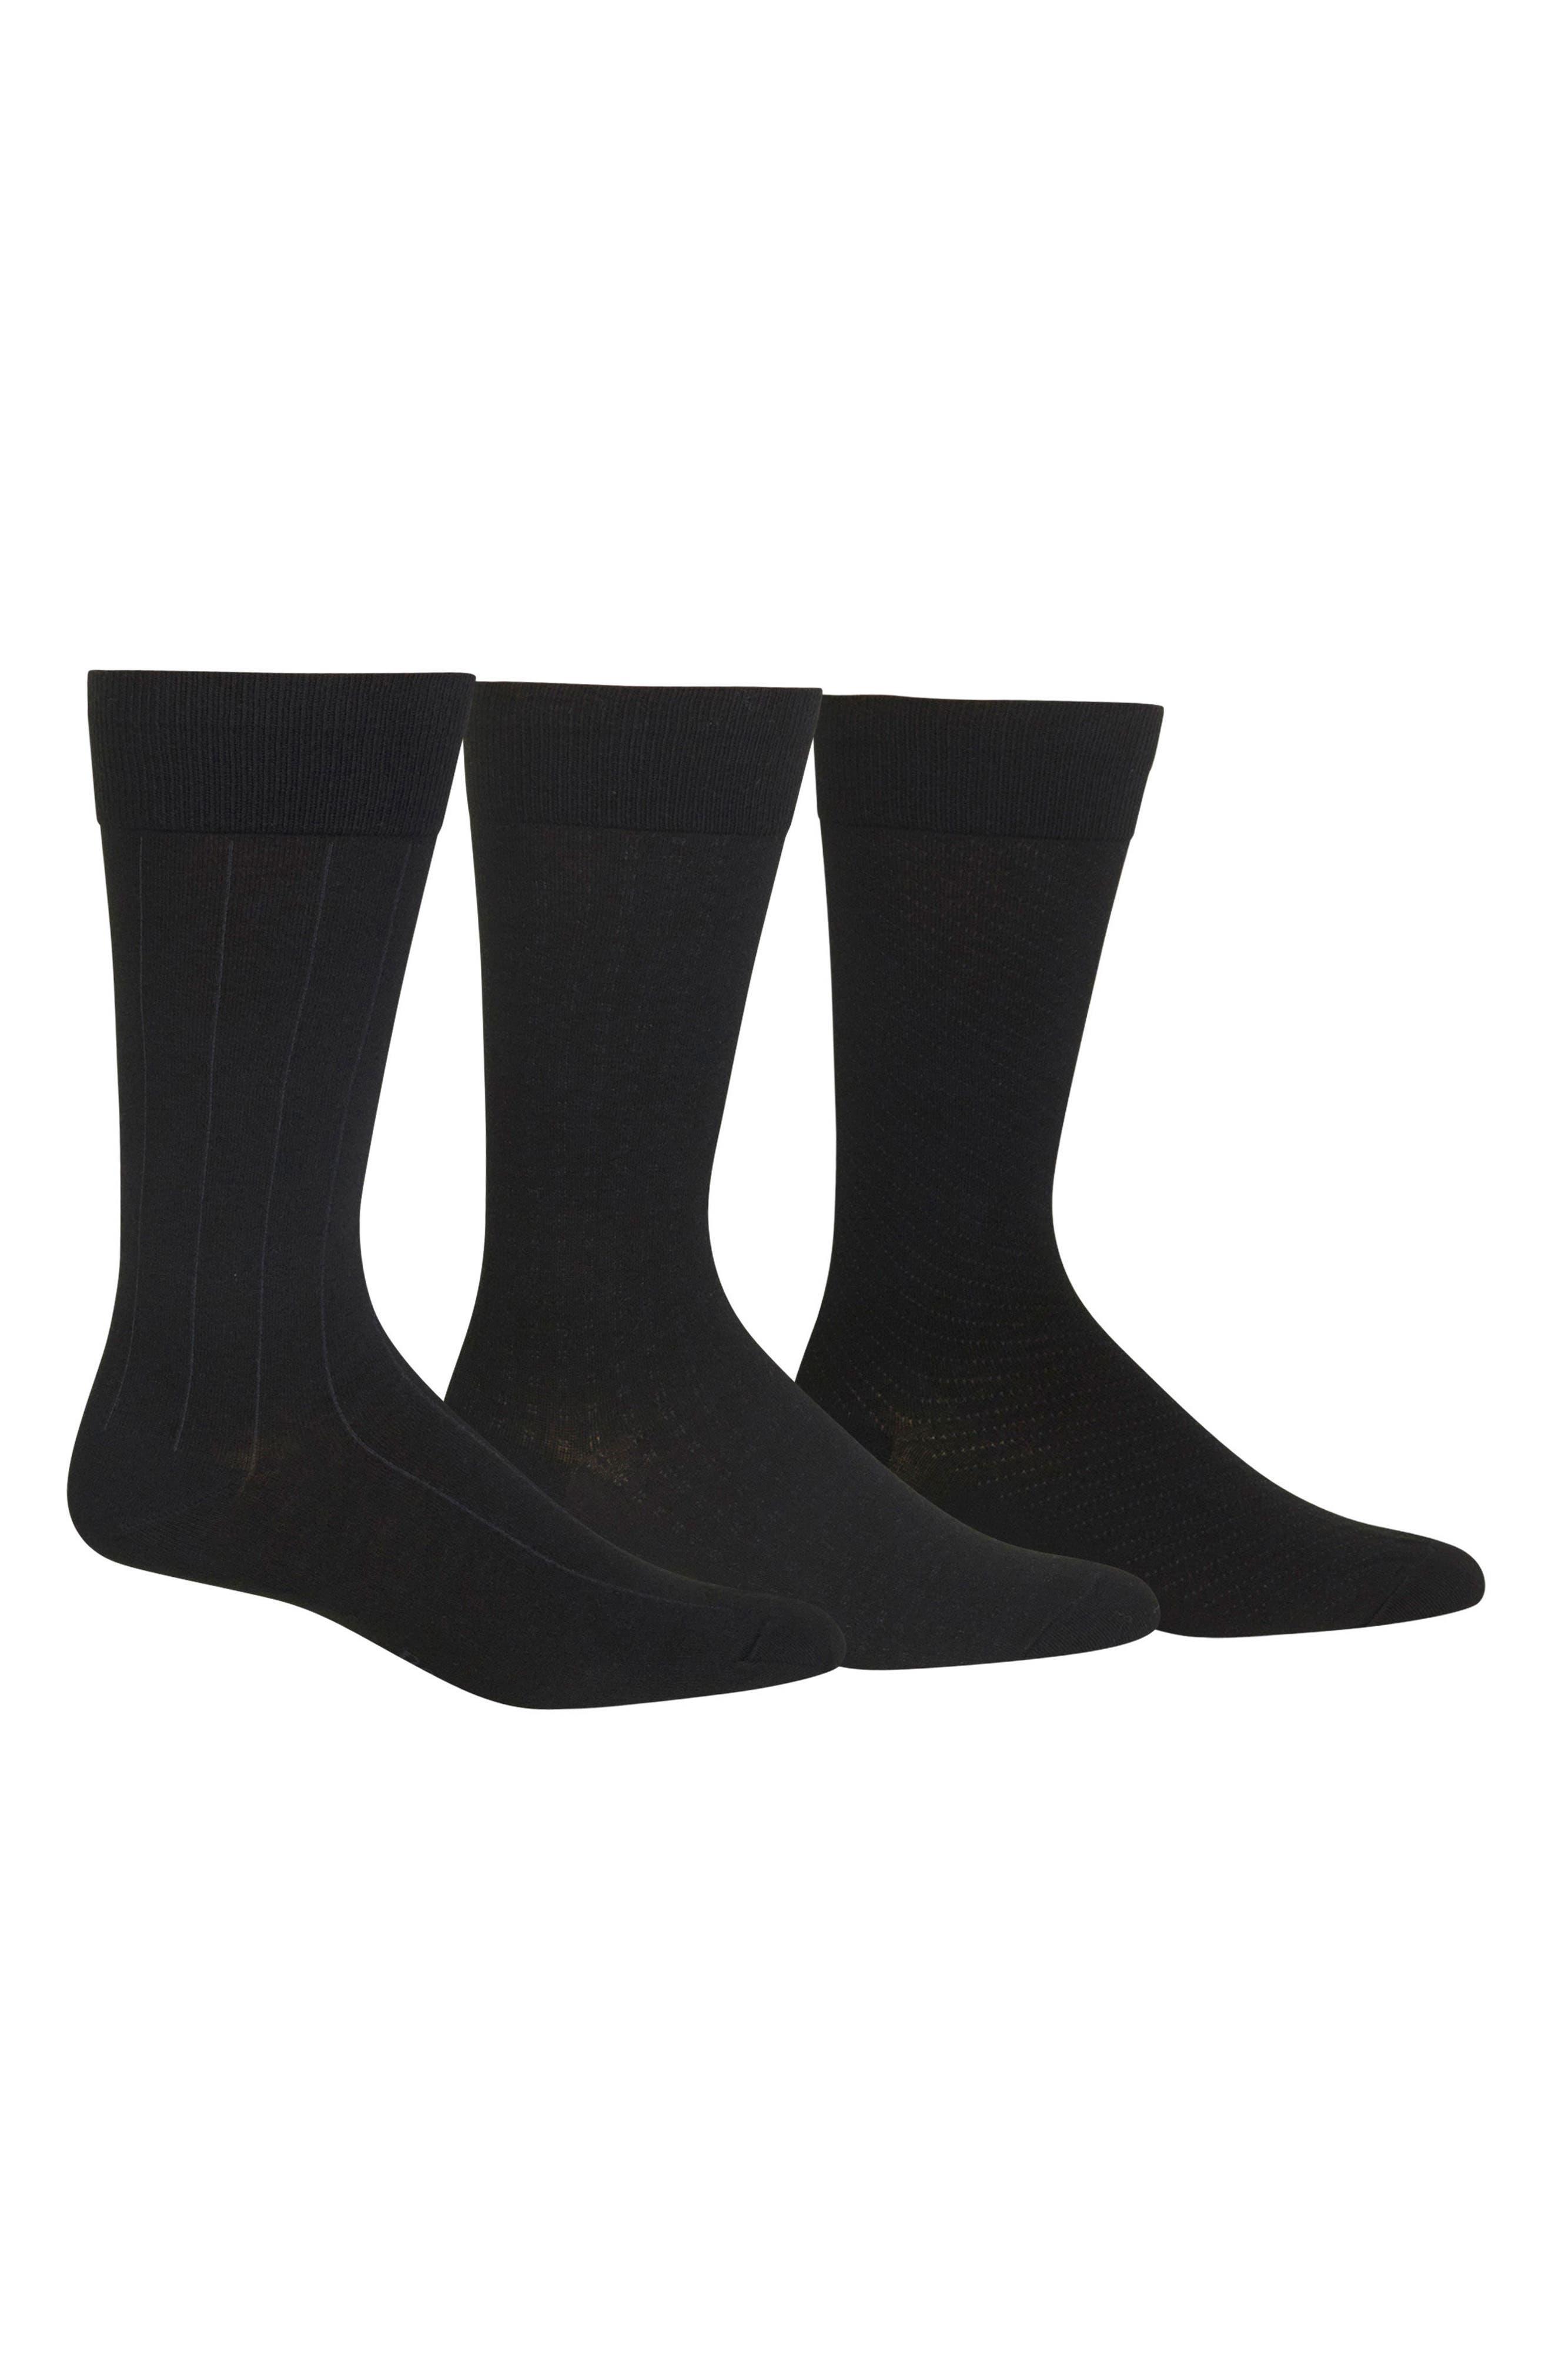 POLO RALPH LAUREN, Dress Socks, Main thumbnail 1, color, BLACK